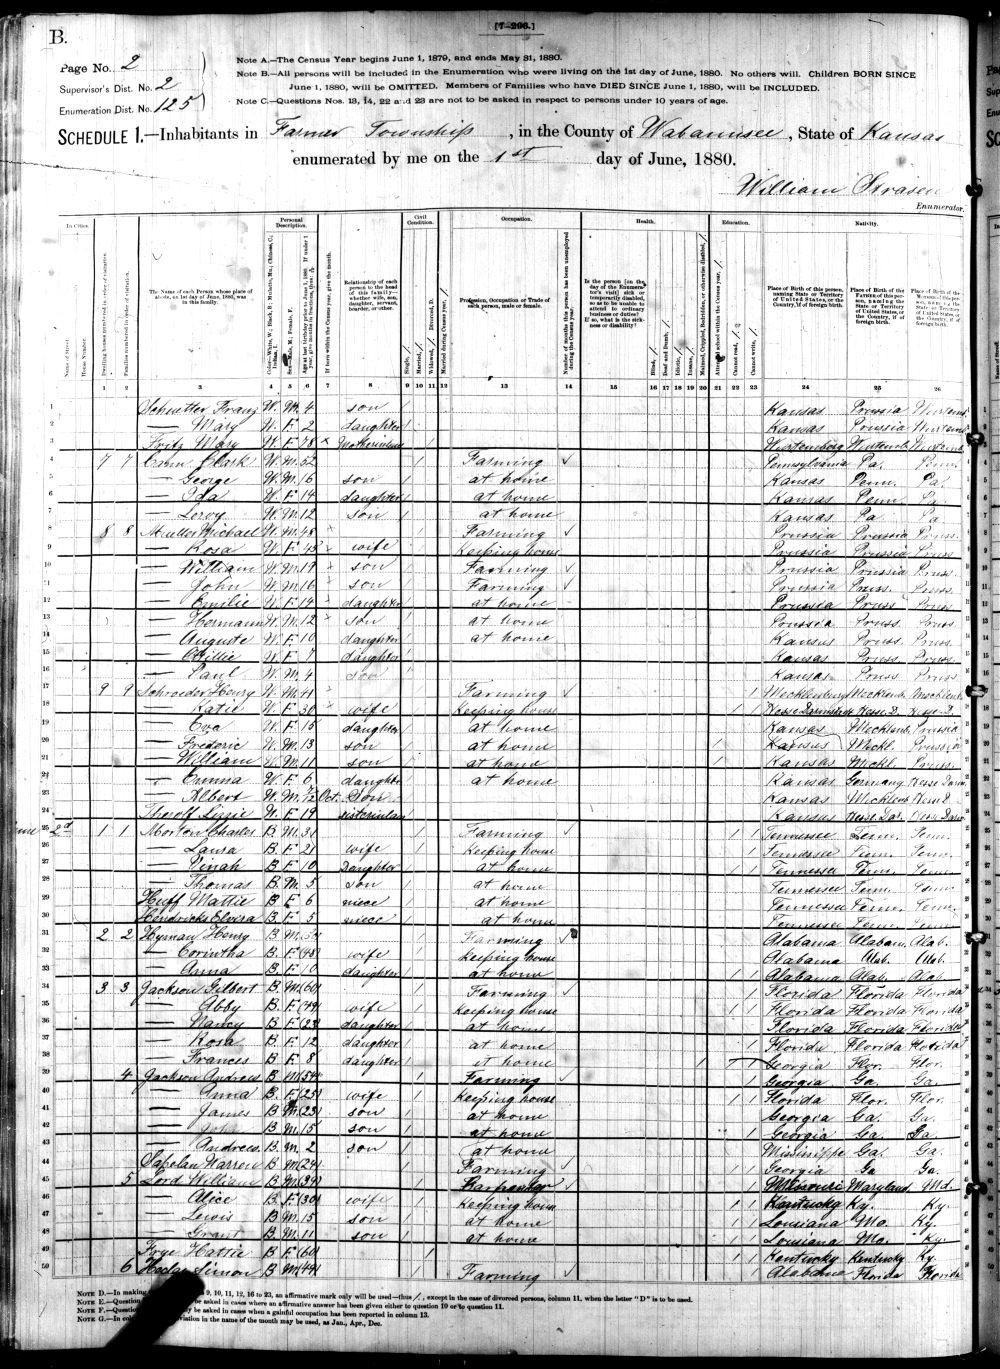 1880 census of Farmer Township, Wabaunsee County, Kansas - 1